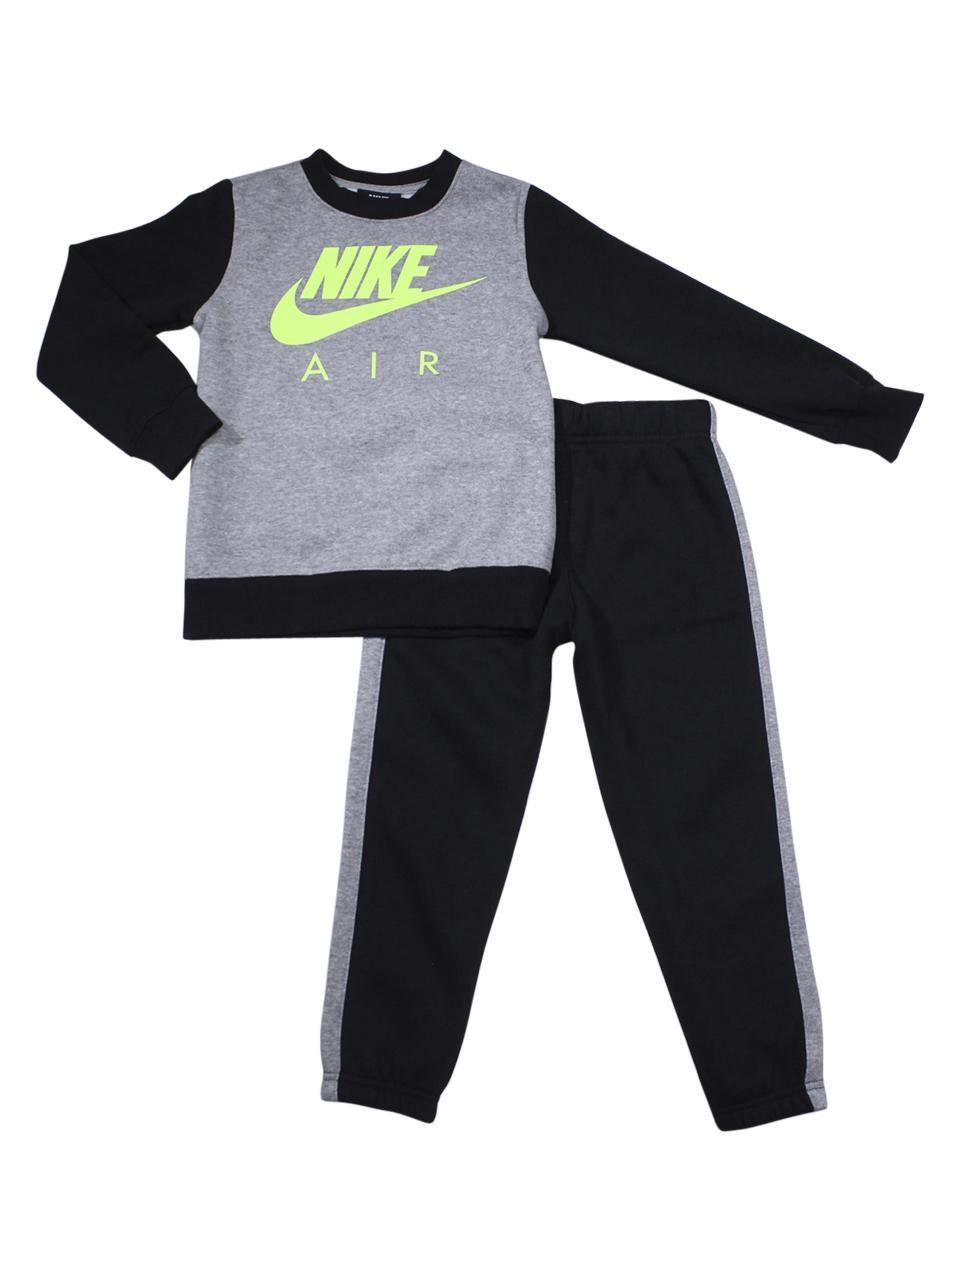 Nike Little Boy's 2-Piece Nike Air Shirt & Pants Set